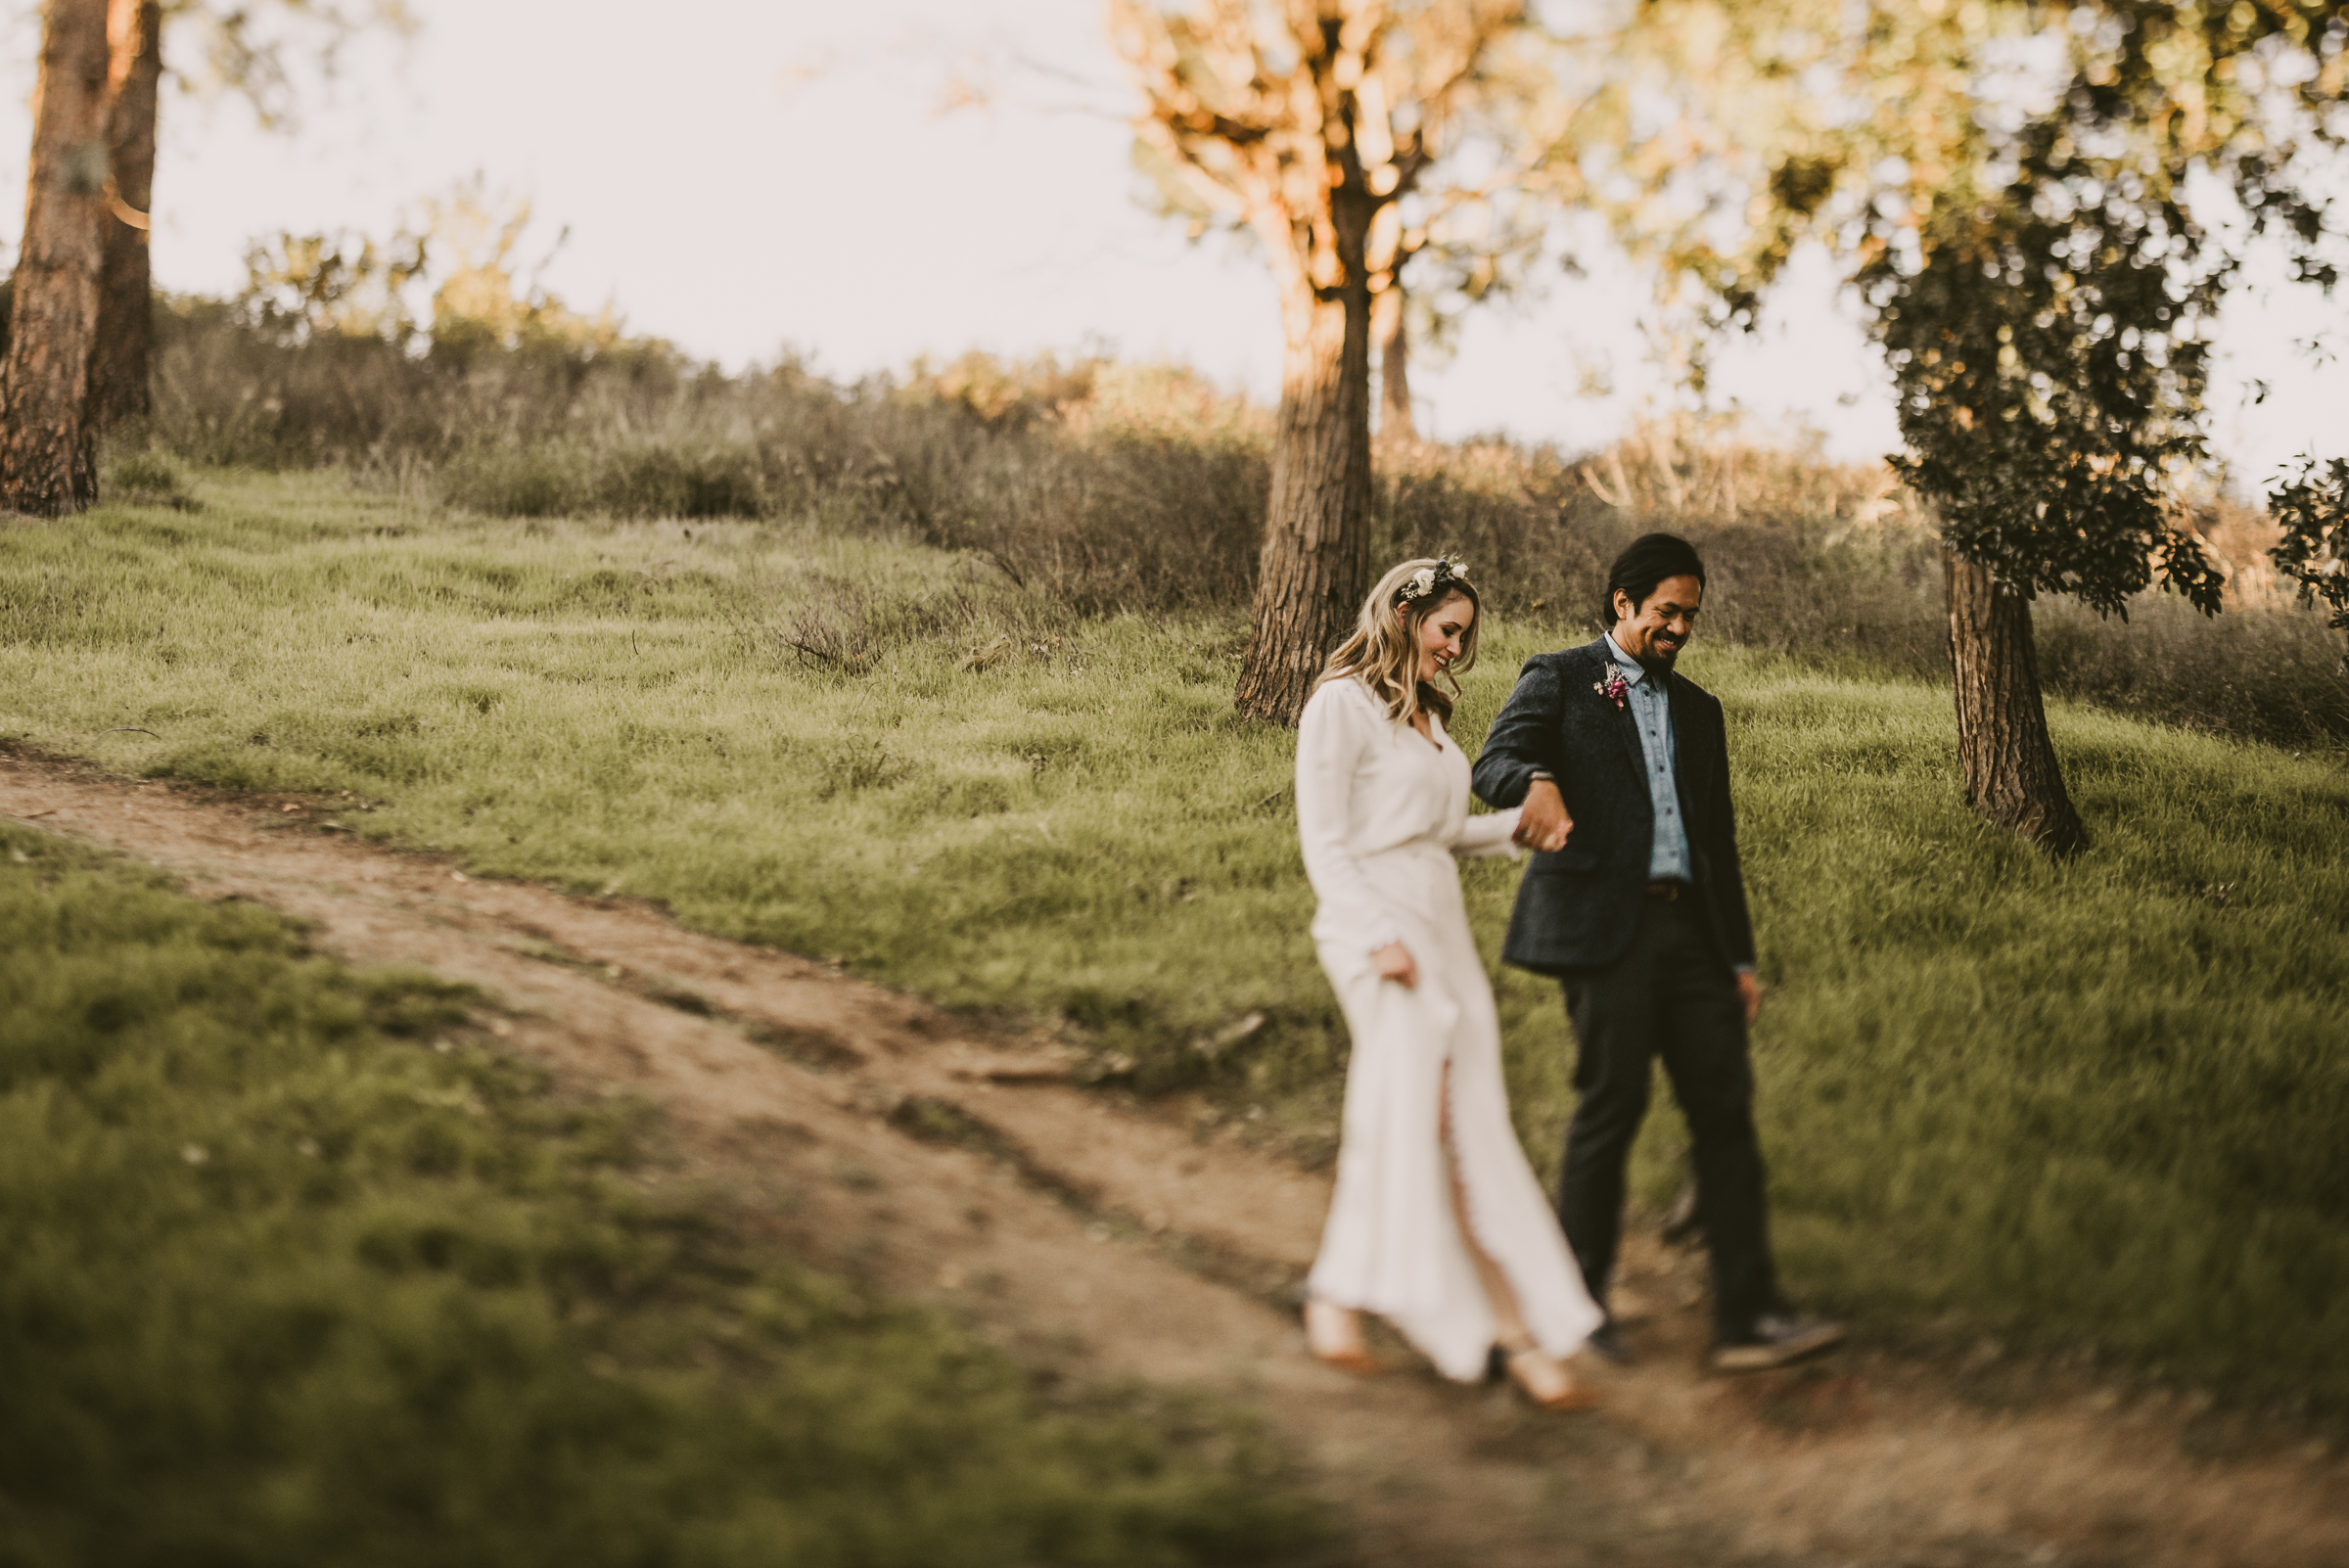 ©Isaiah + Taylor Photography - Intimate Elopement, Eaton Canyon, Los Angeles Wedding Photographer-62.jpg